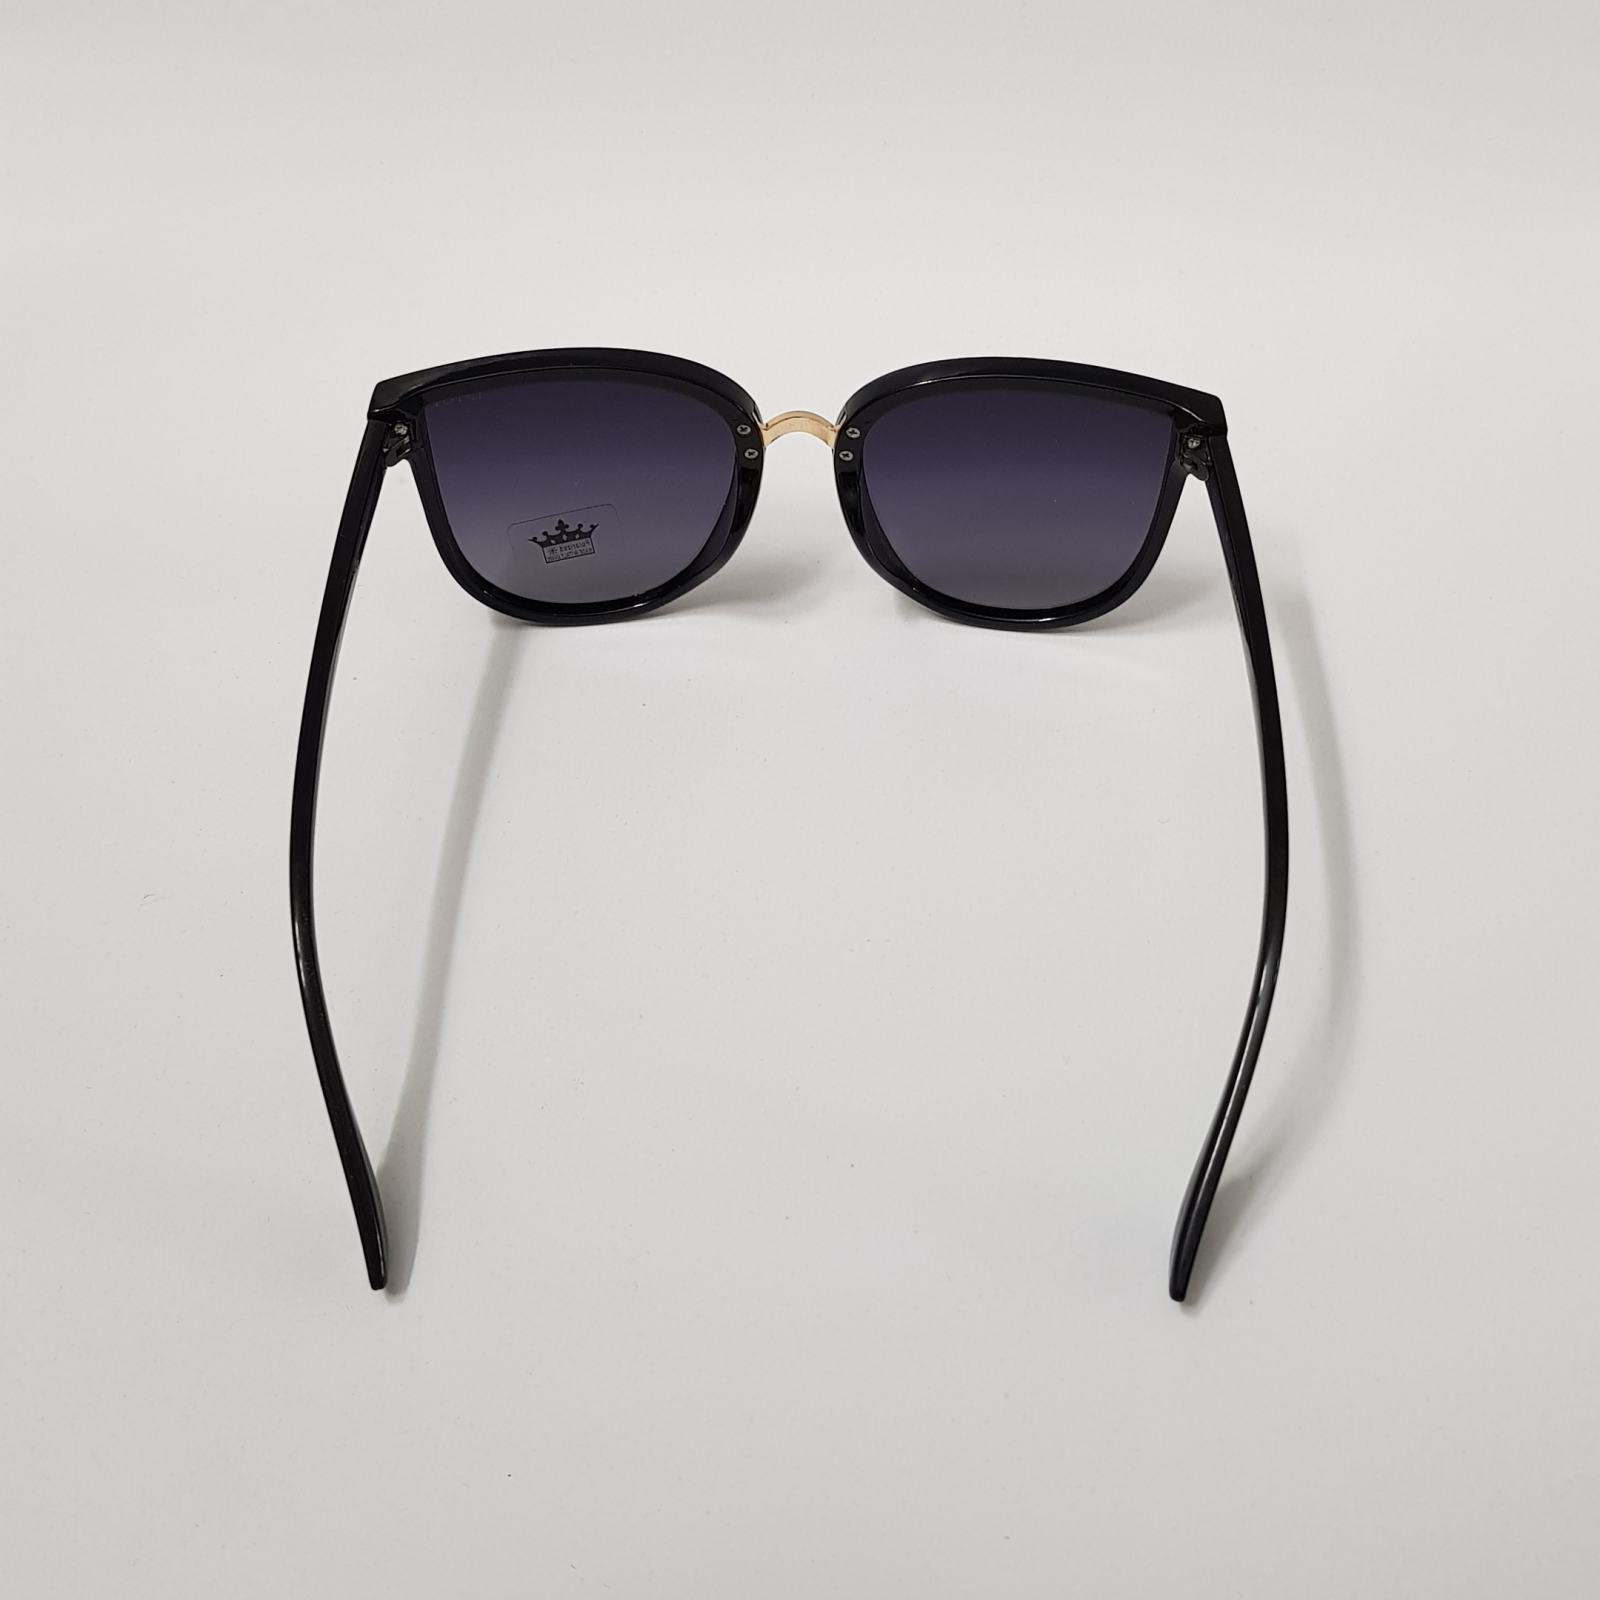 عینک آفتابی زنانه دیور کد 3030D1 main 1 2